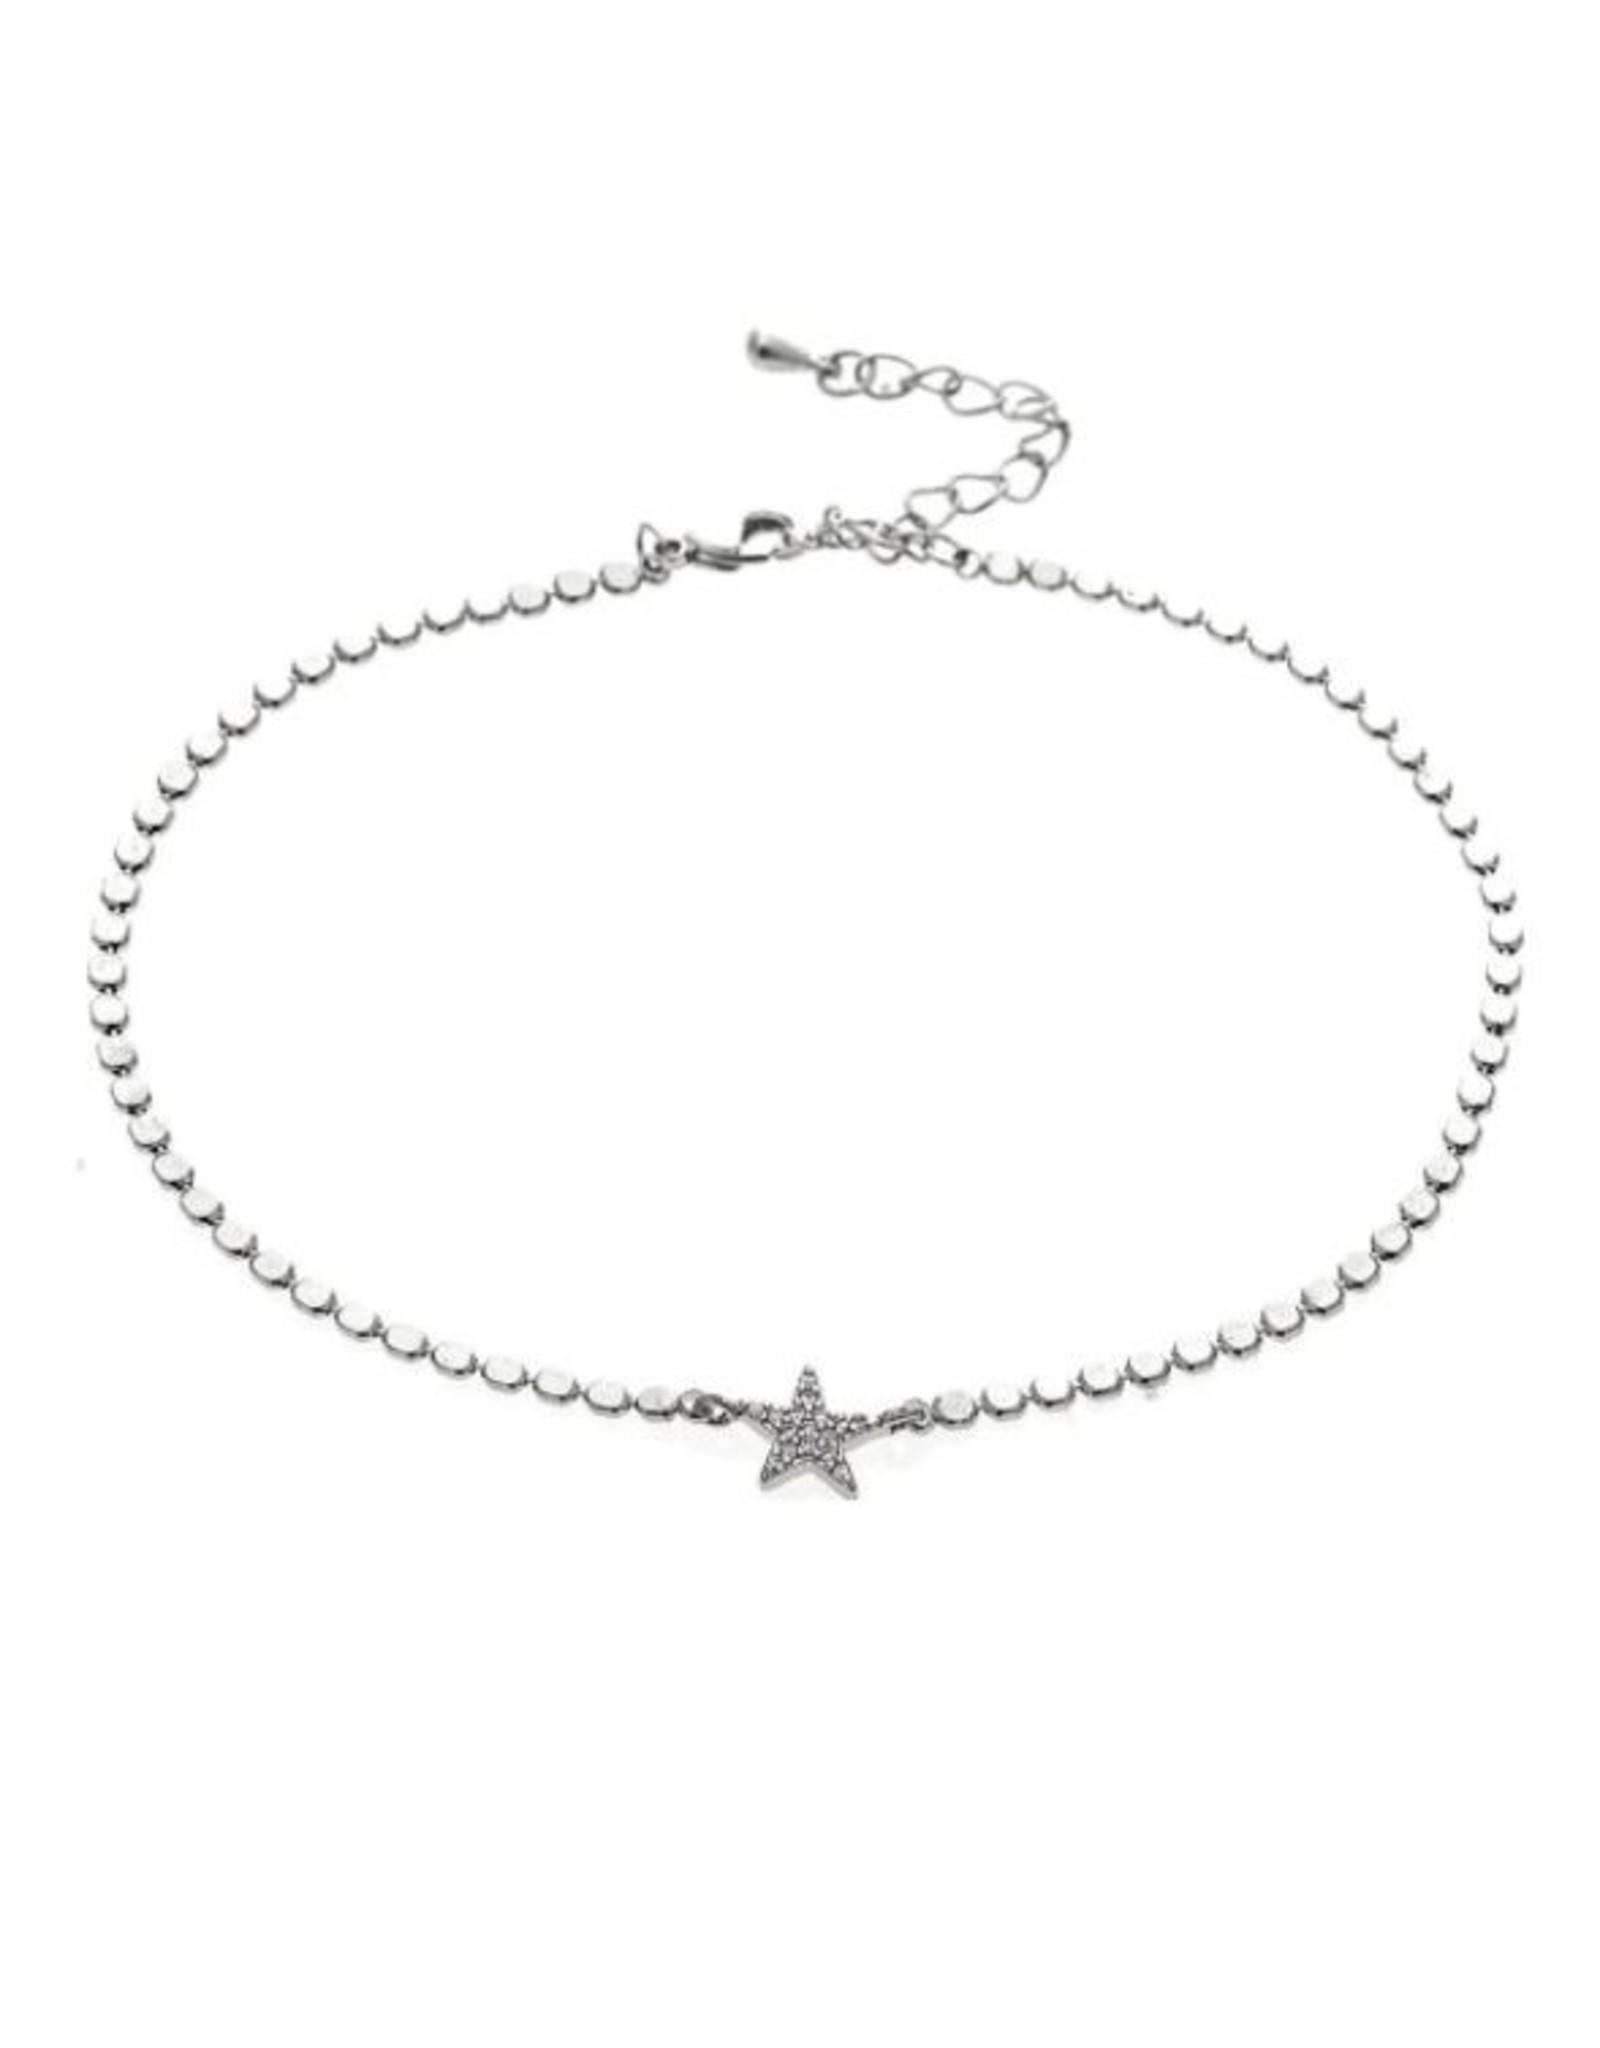 Rain Jewelry CRYSTAL STAR CHARM ANKLET